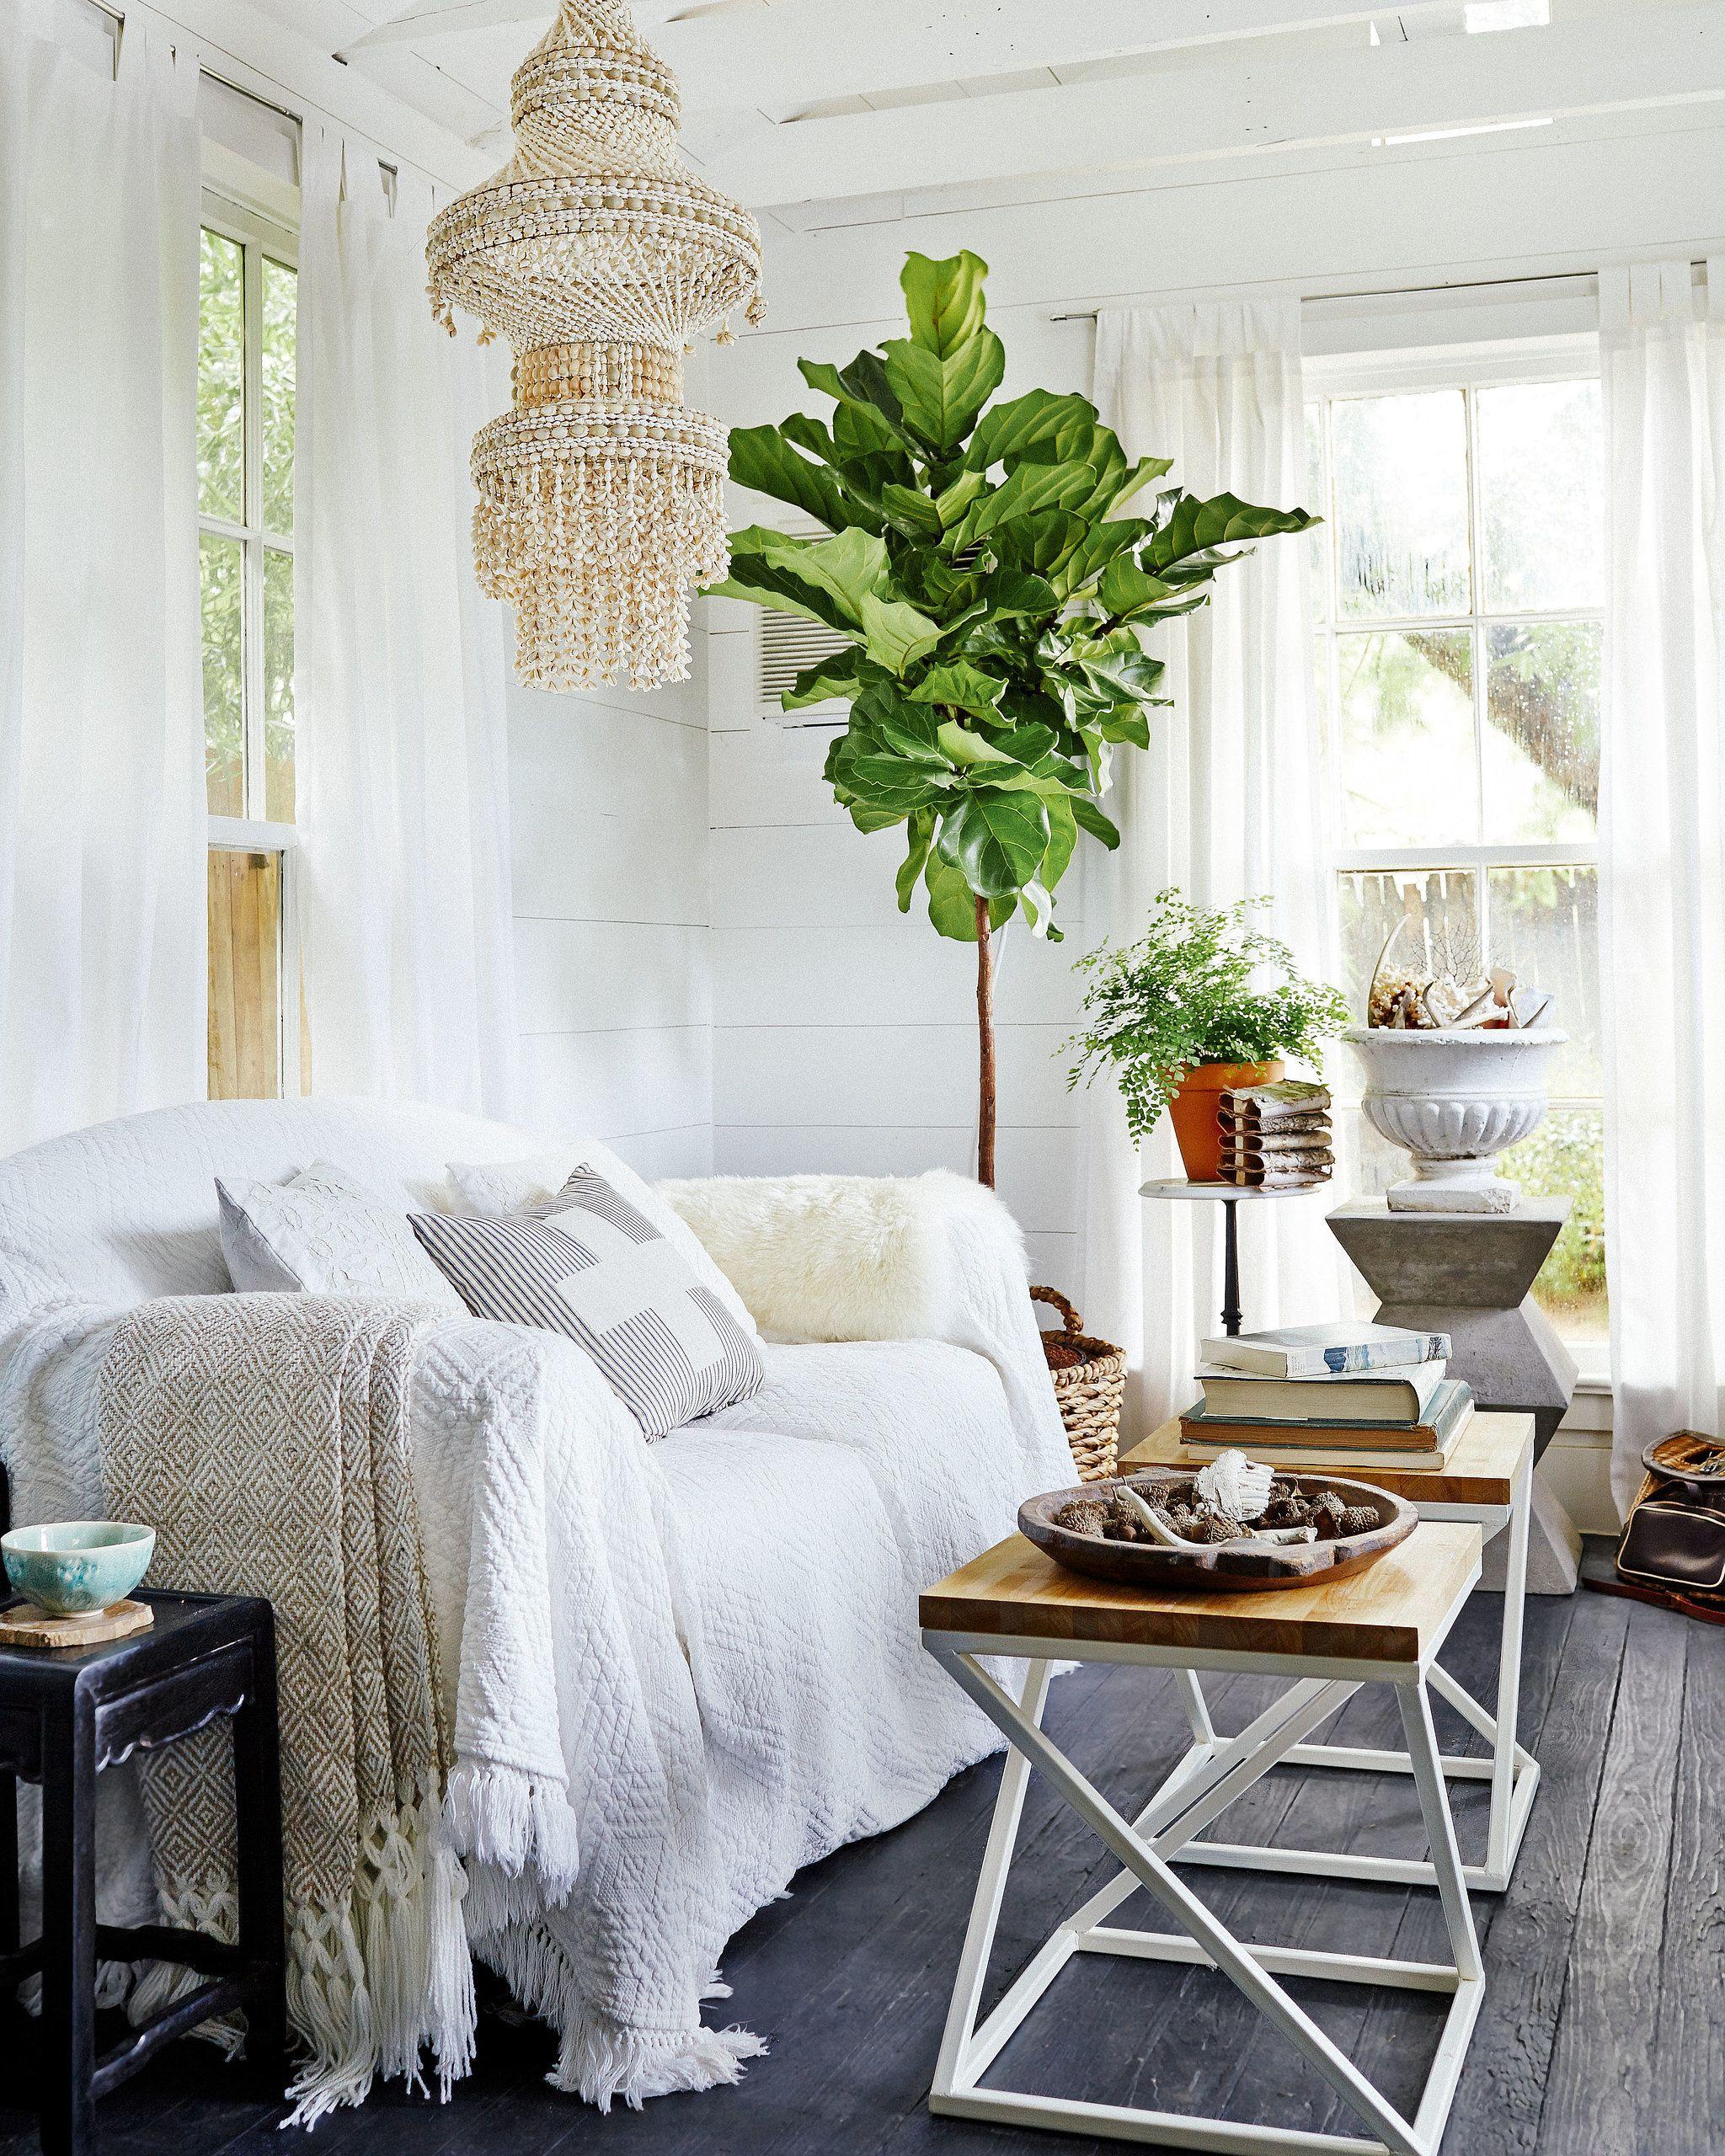 A Backyard Shed Be es a Mini Dream Home